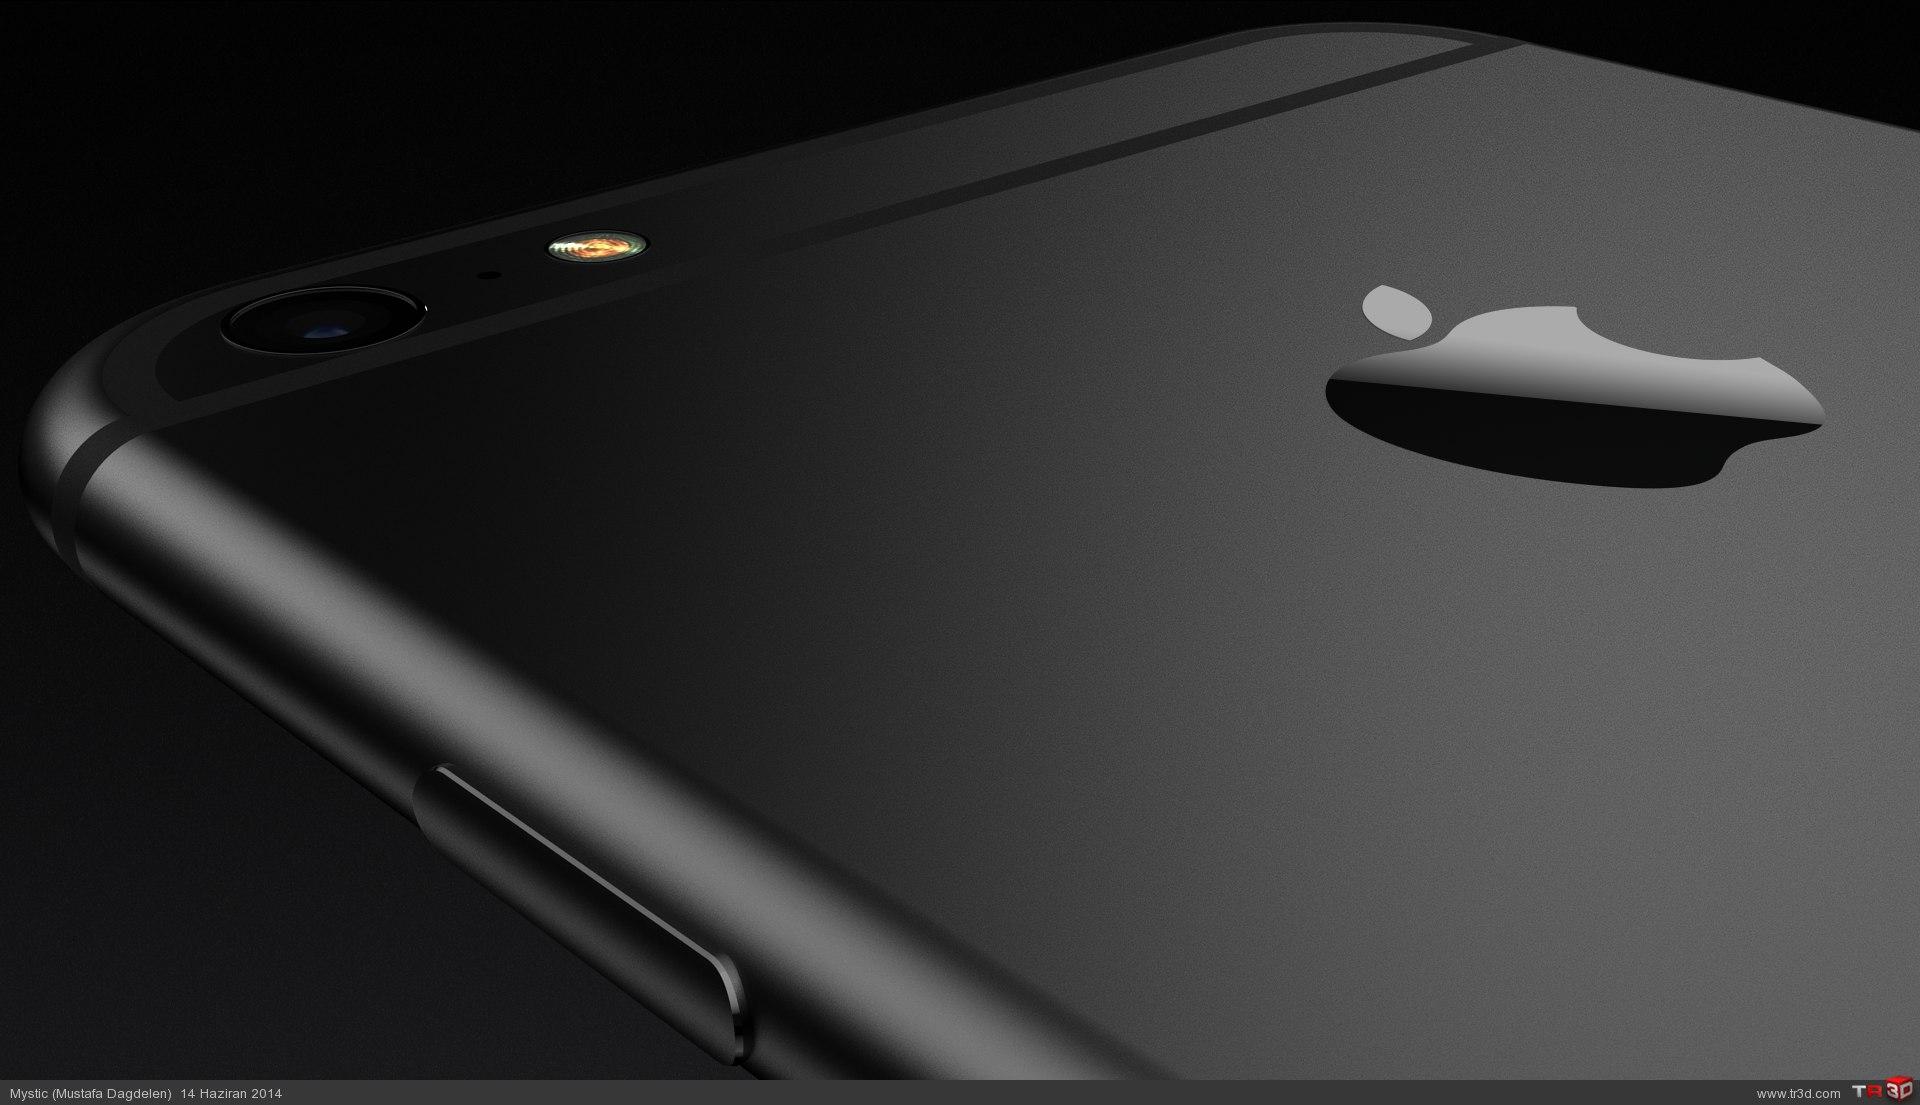 Apple iPhone 6 Finally 4